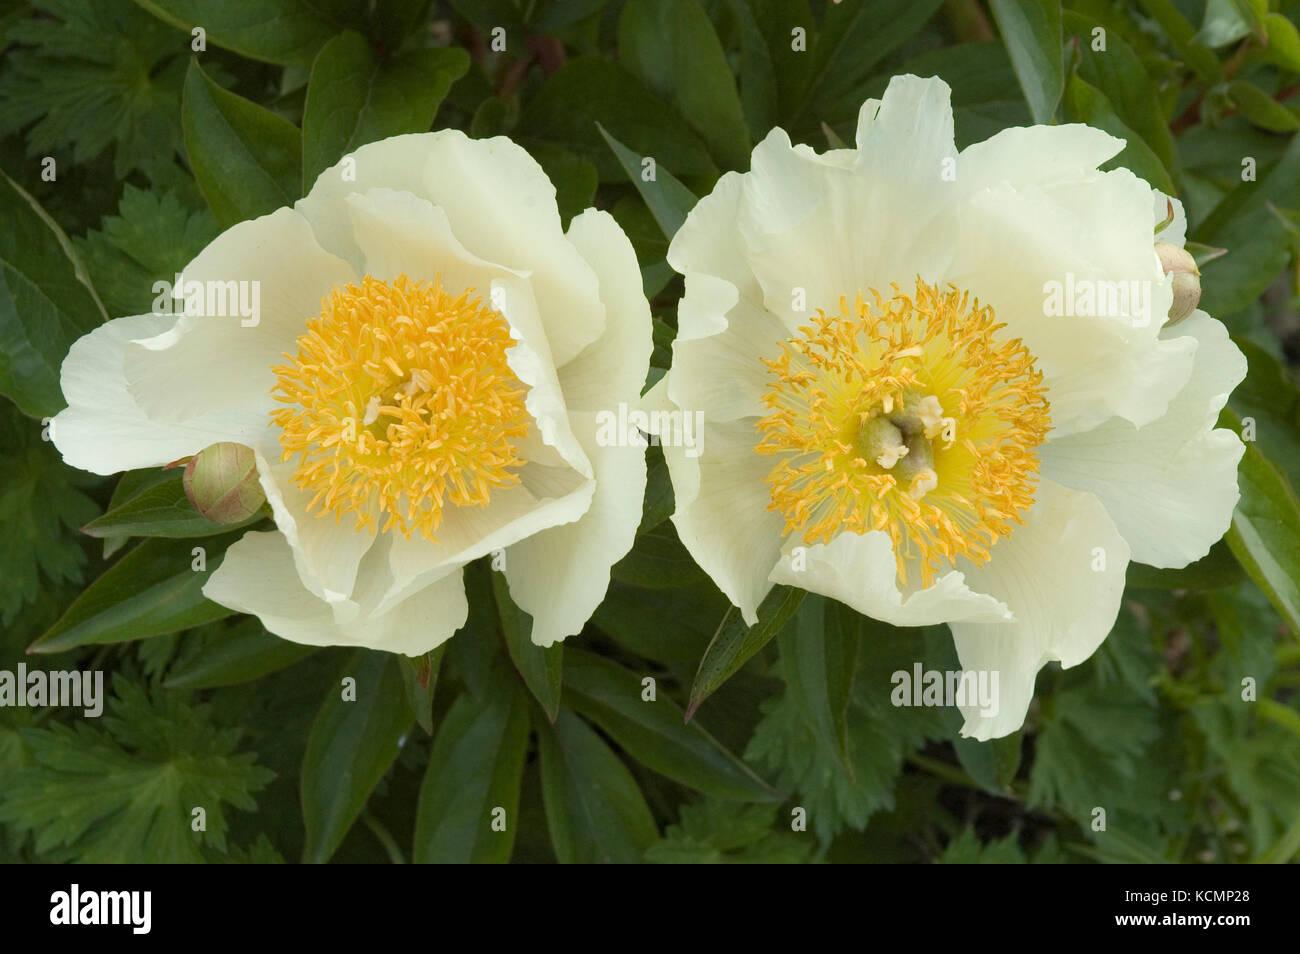 white peonies - Stock Image